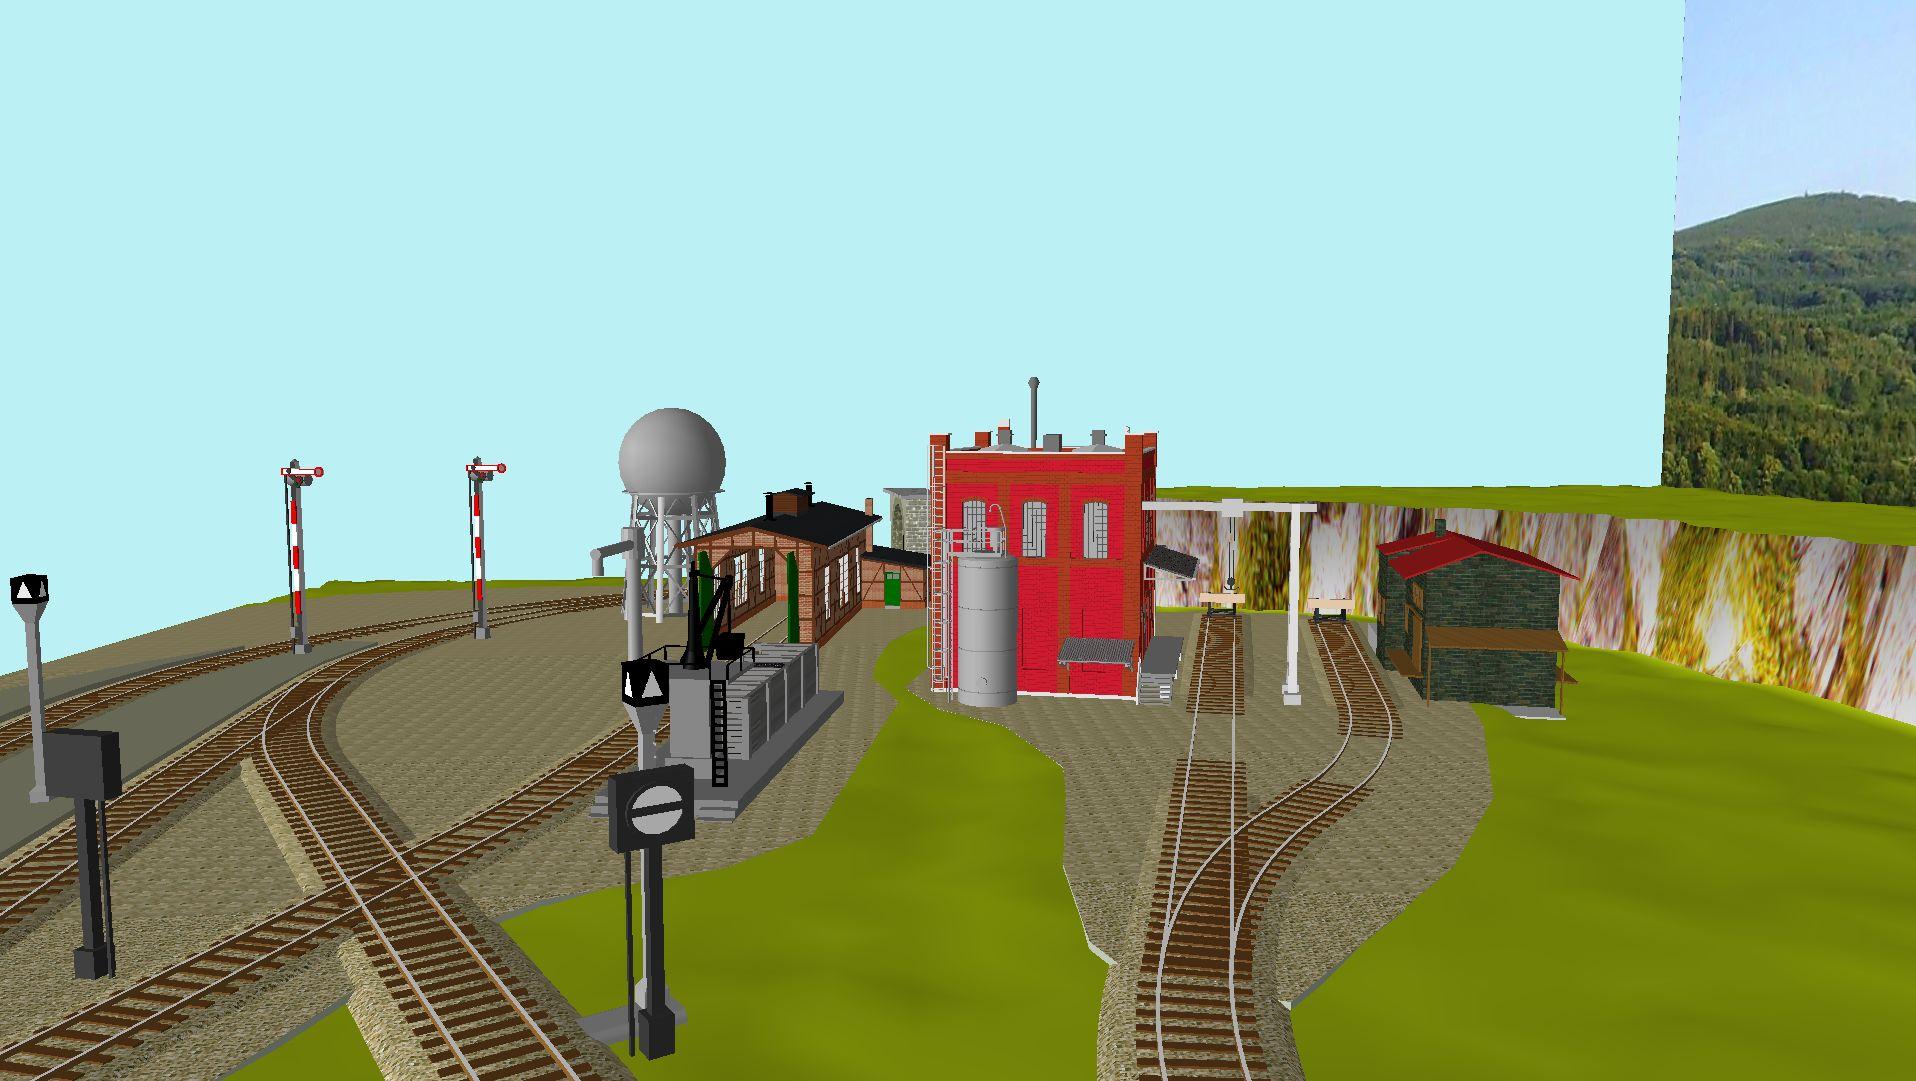 'ALBA Modellbahnpraxis' Band 1, Plan 5 Amp-1_5_m-gleis_jrg_5n5kyv